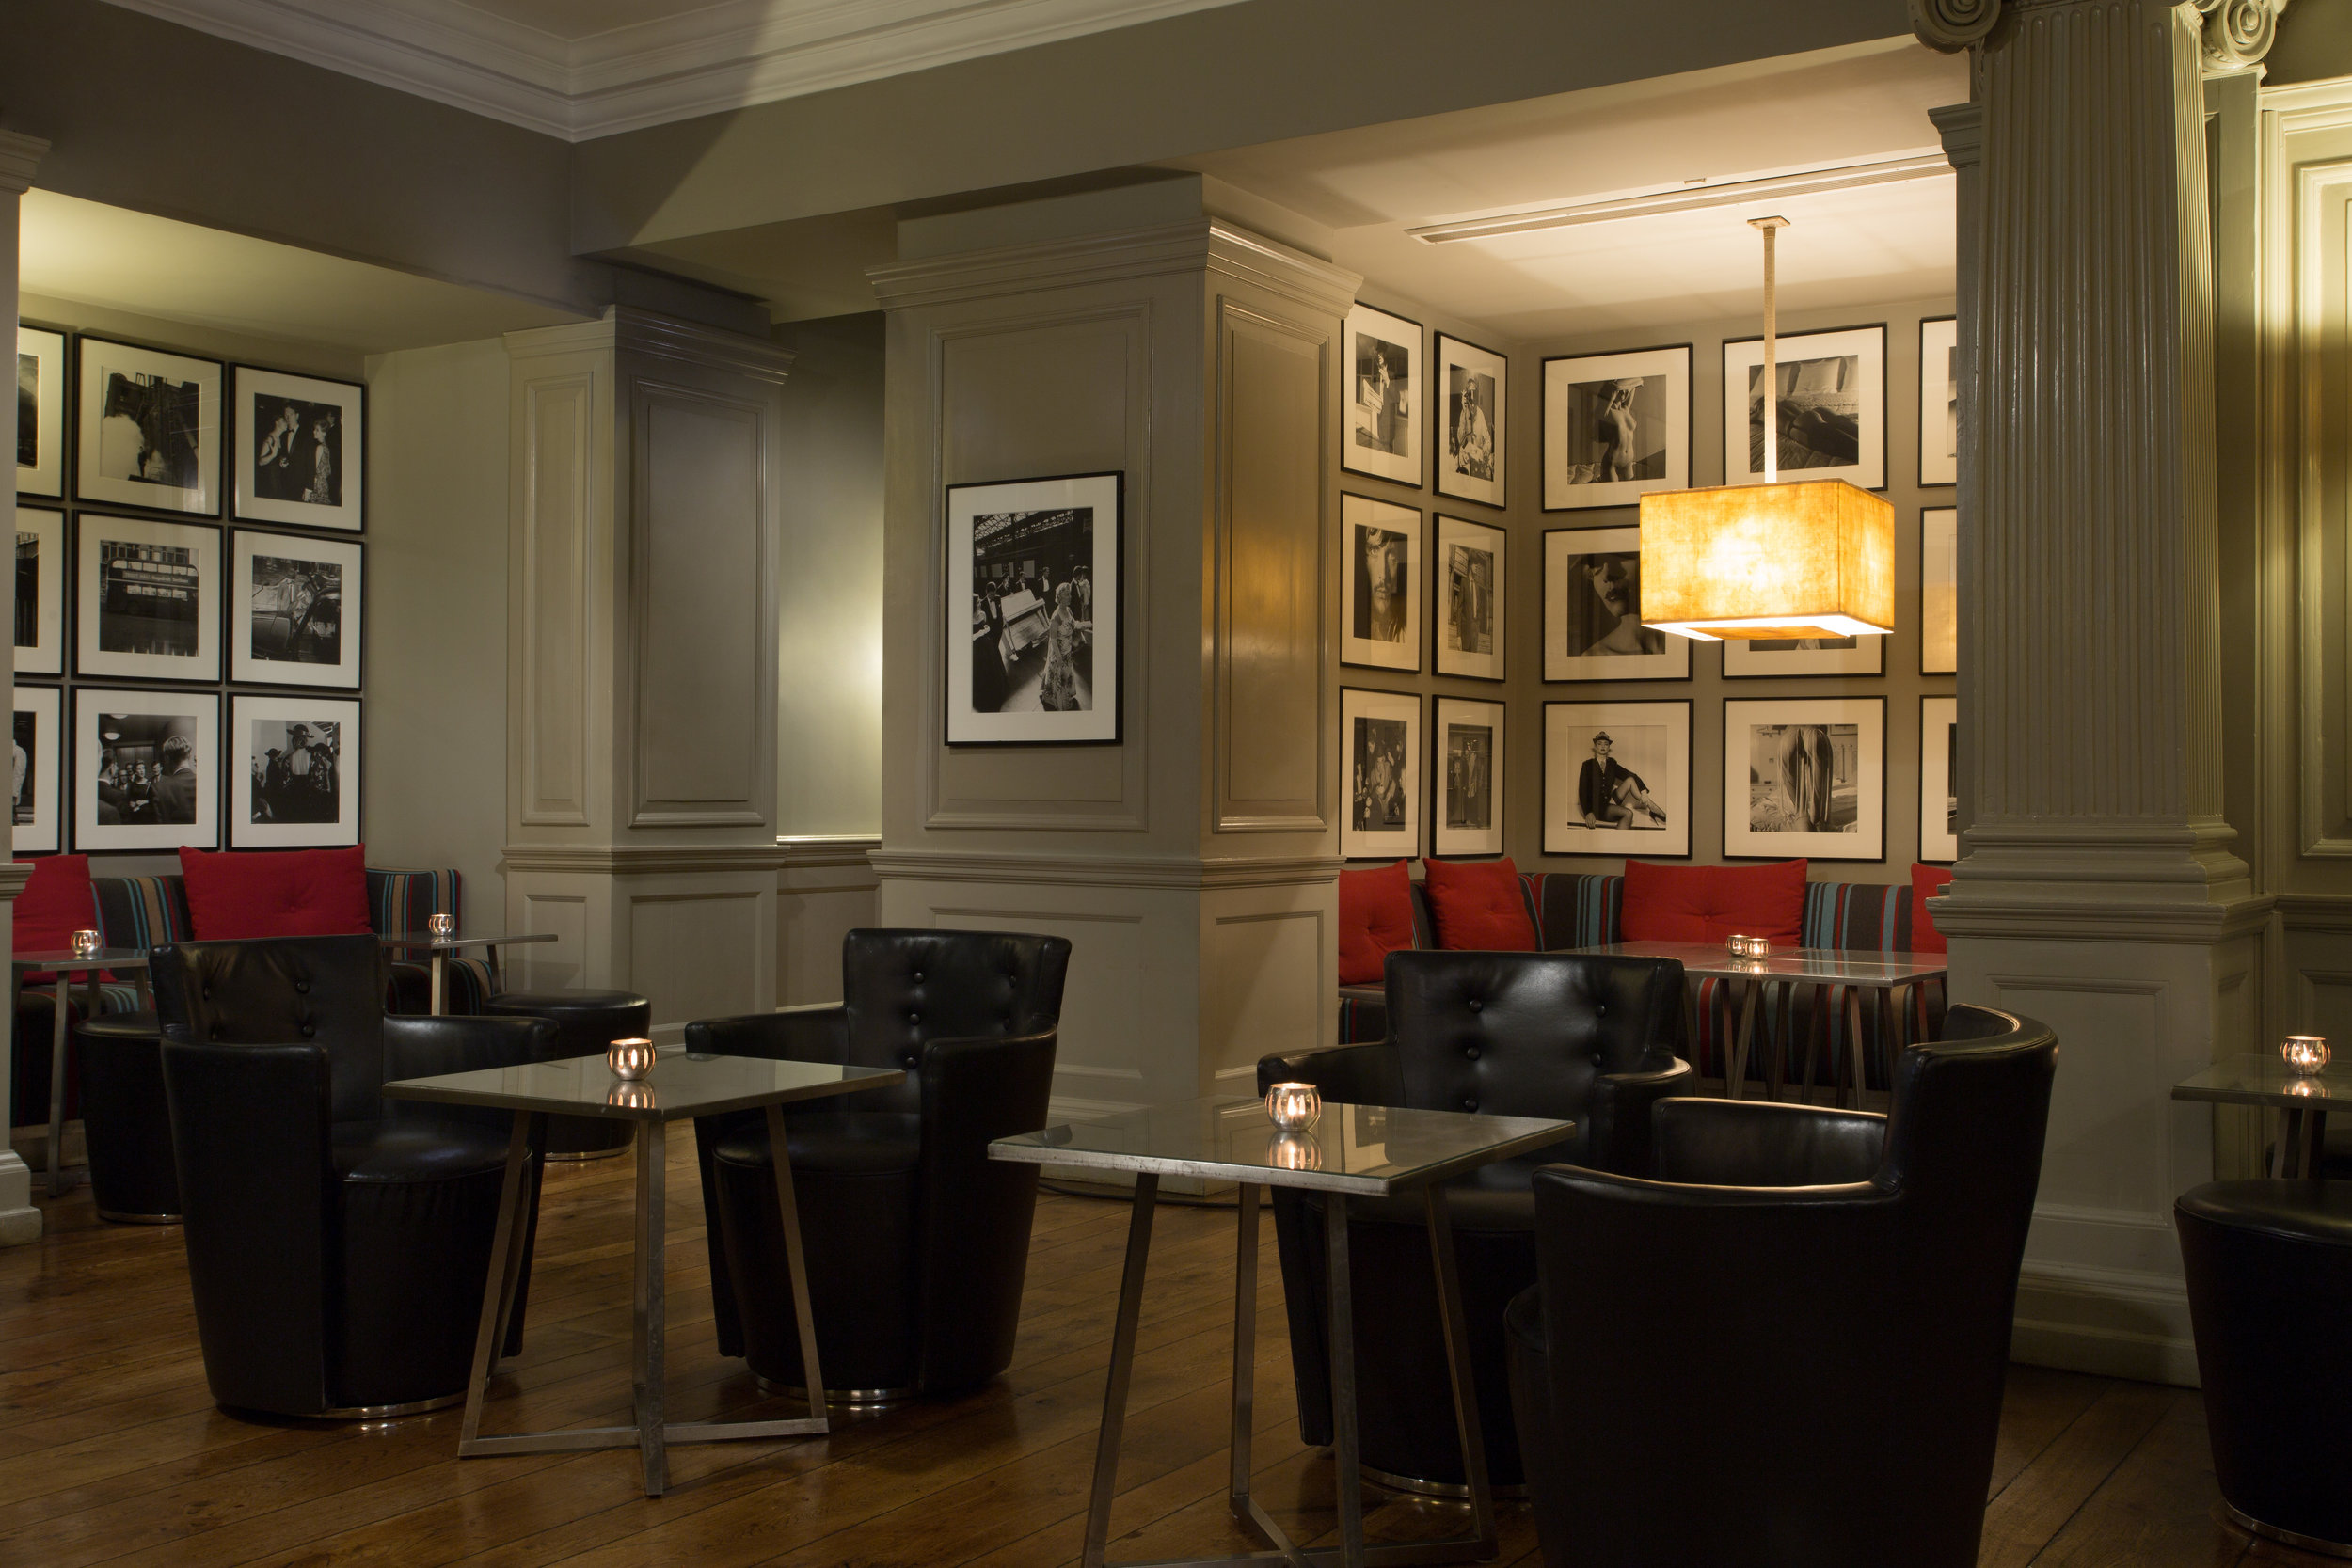 9 RFH Brown's Hotel - Donovan Bar 6025 JG Oct 16.jpg